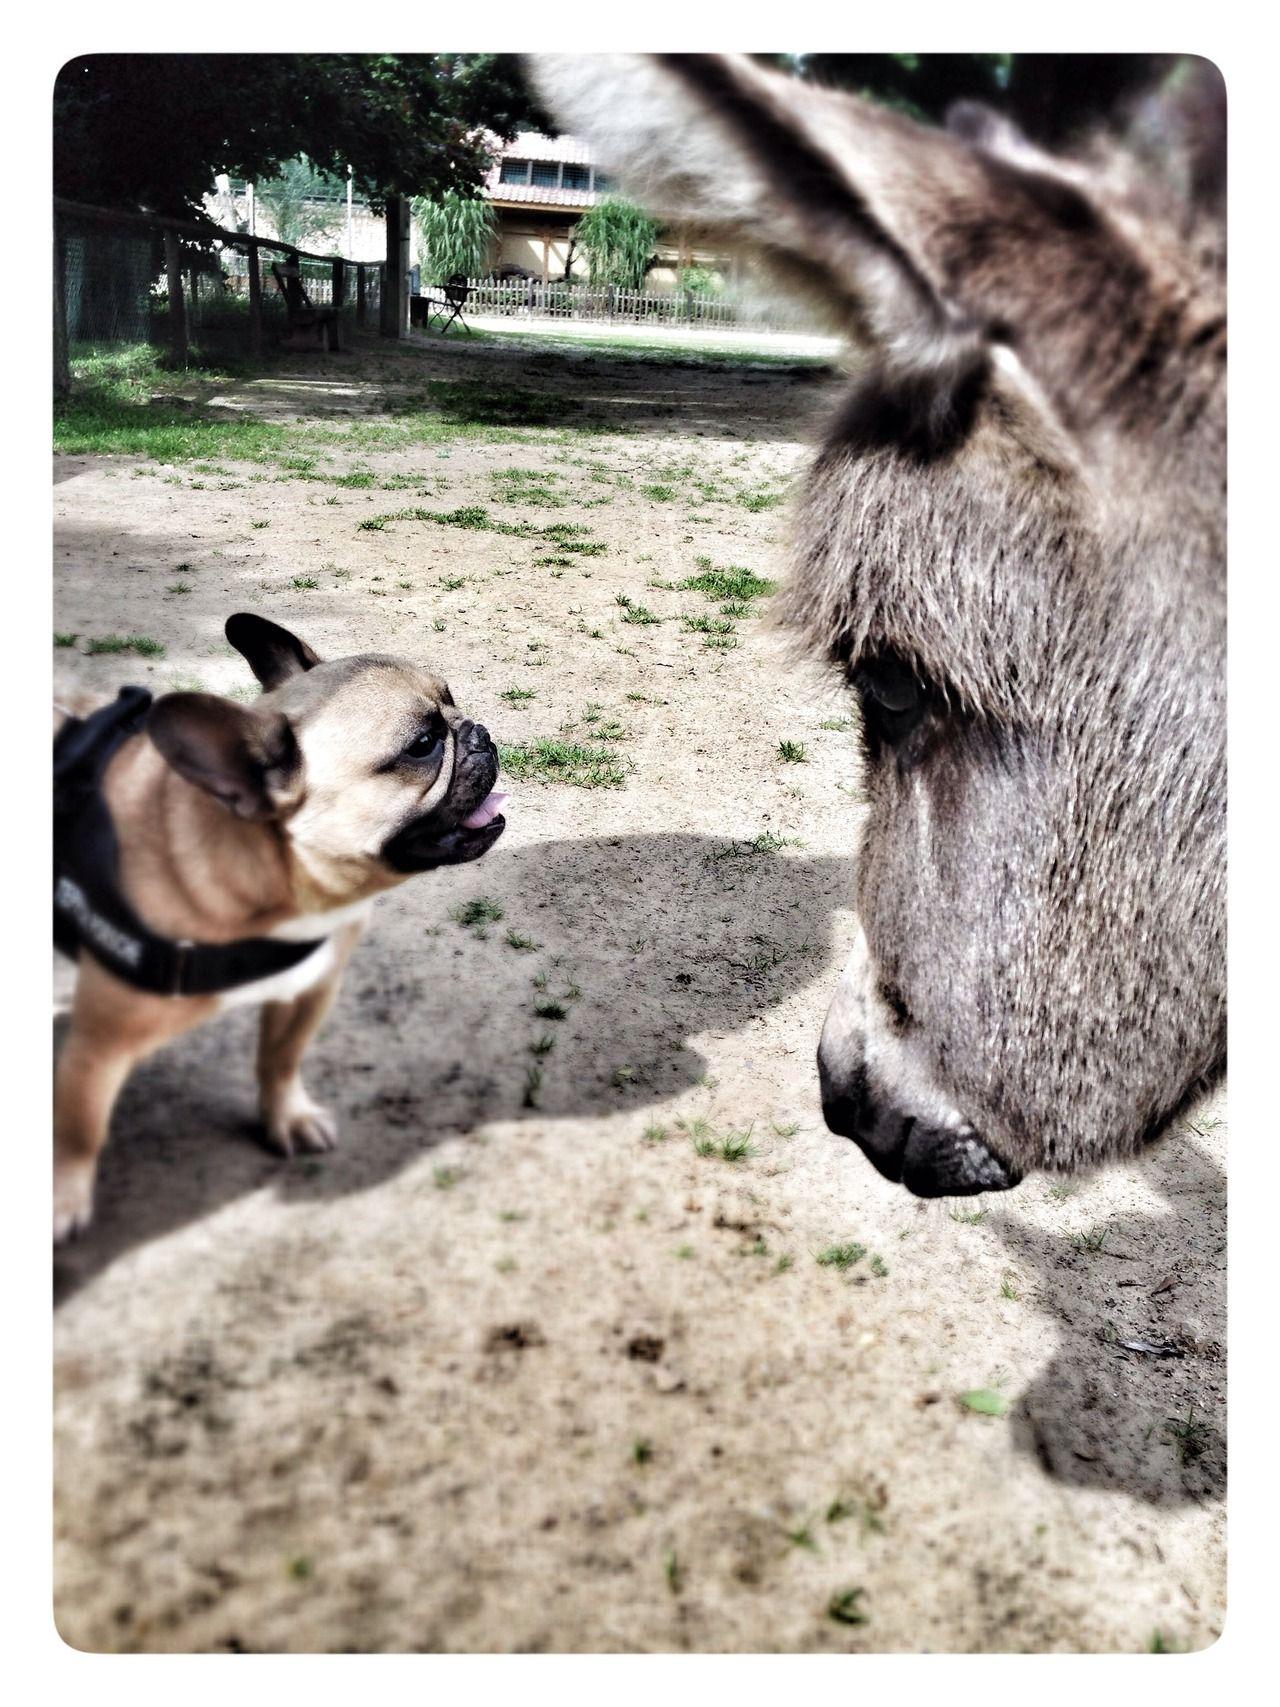 French Bulldog meets a Donkey.